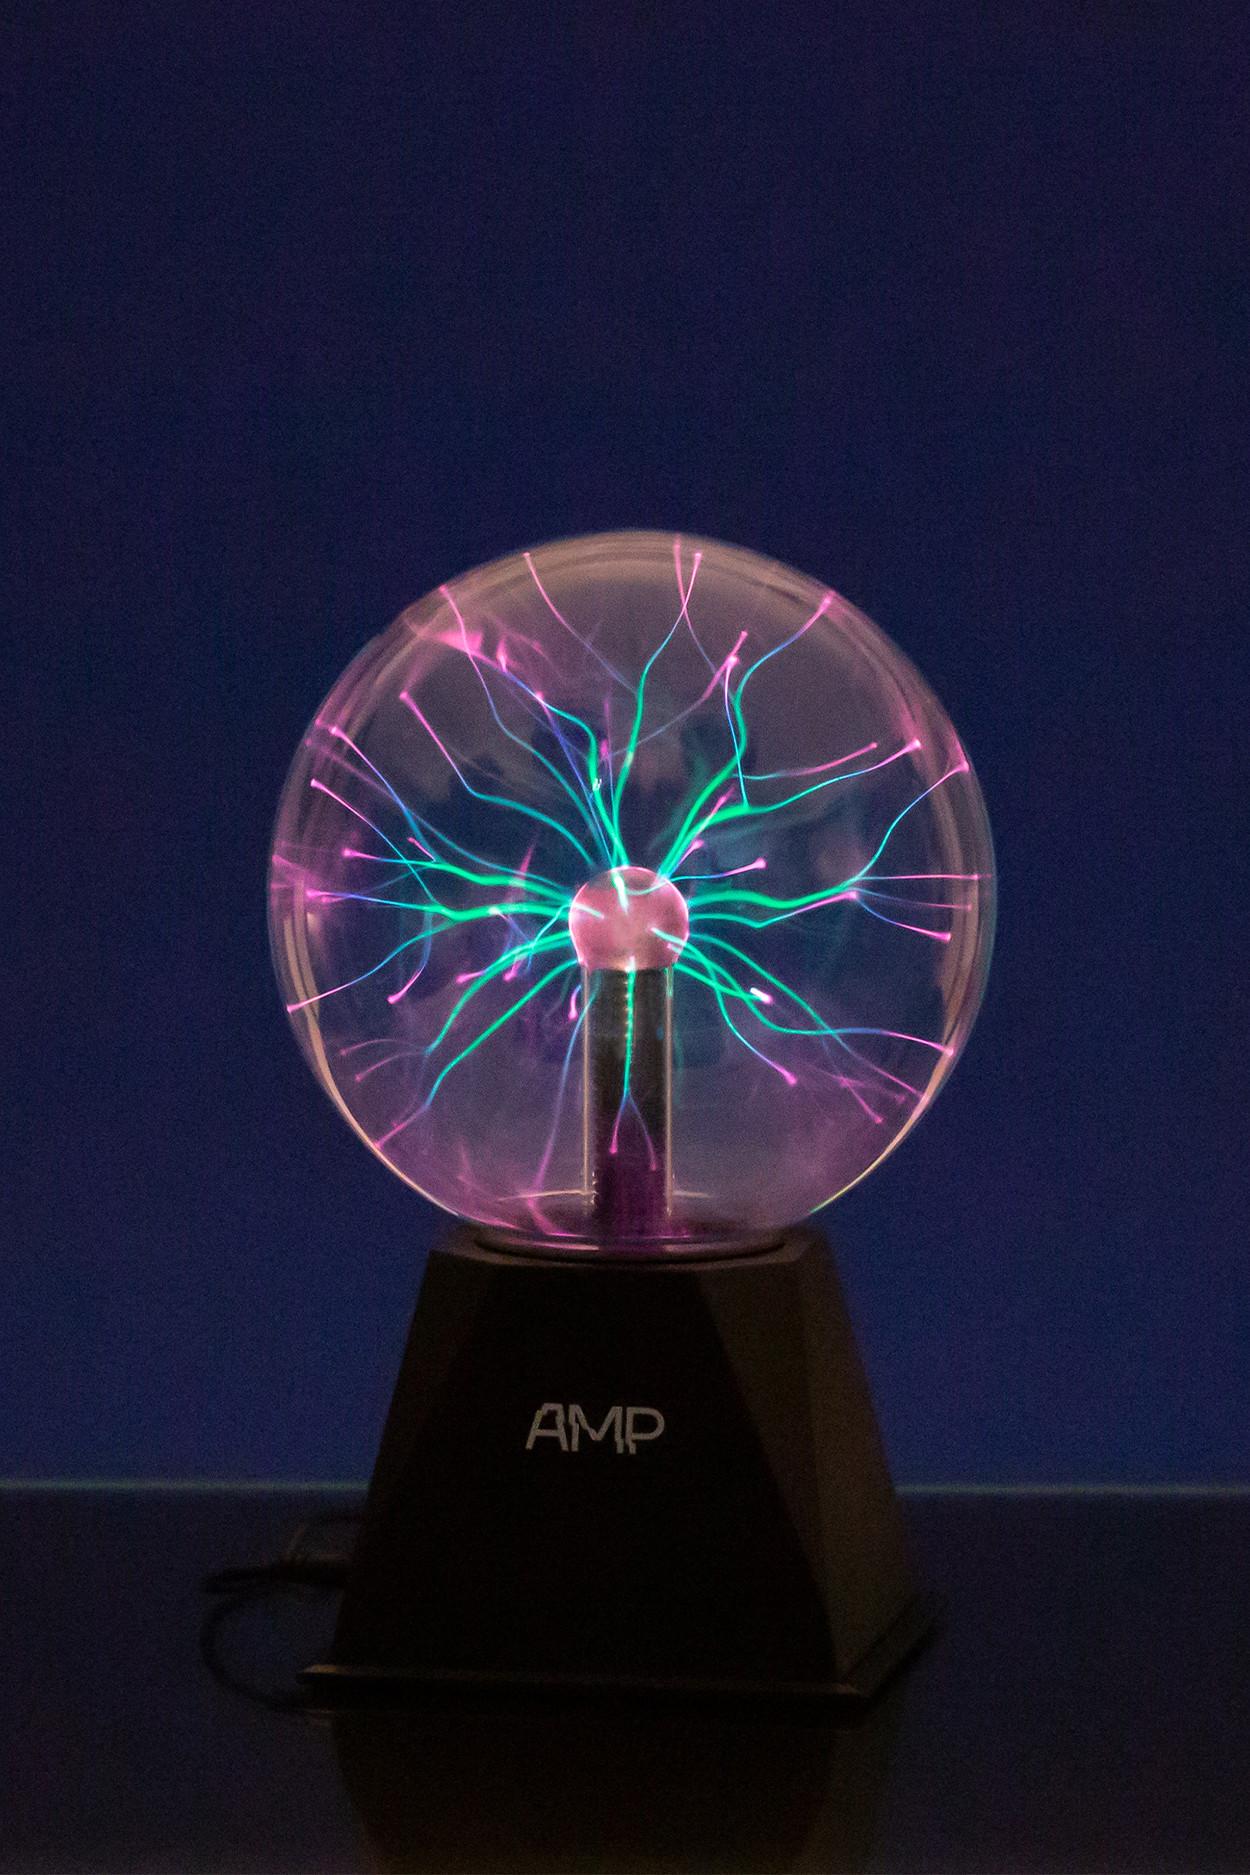 Плазменный шар Amperia Greenflow 16см (Тесла) Audio от 2 241 руб